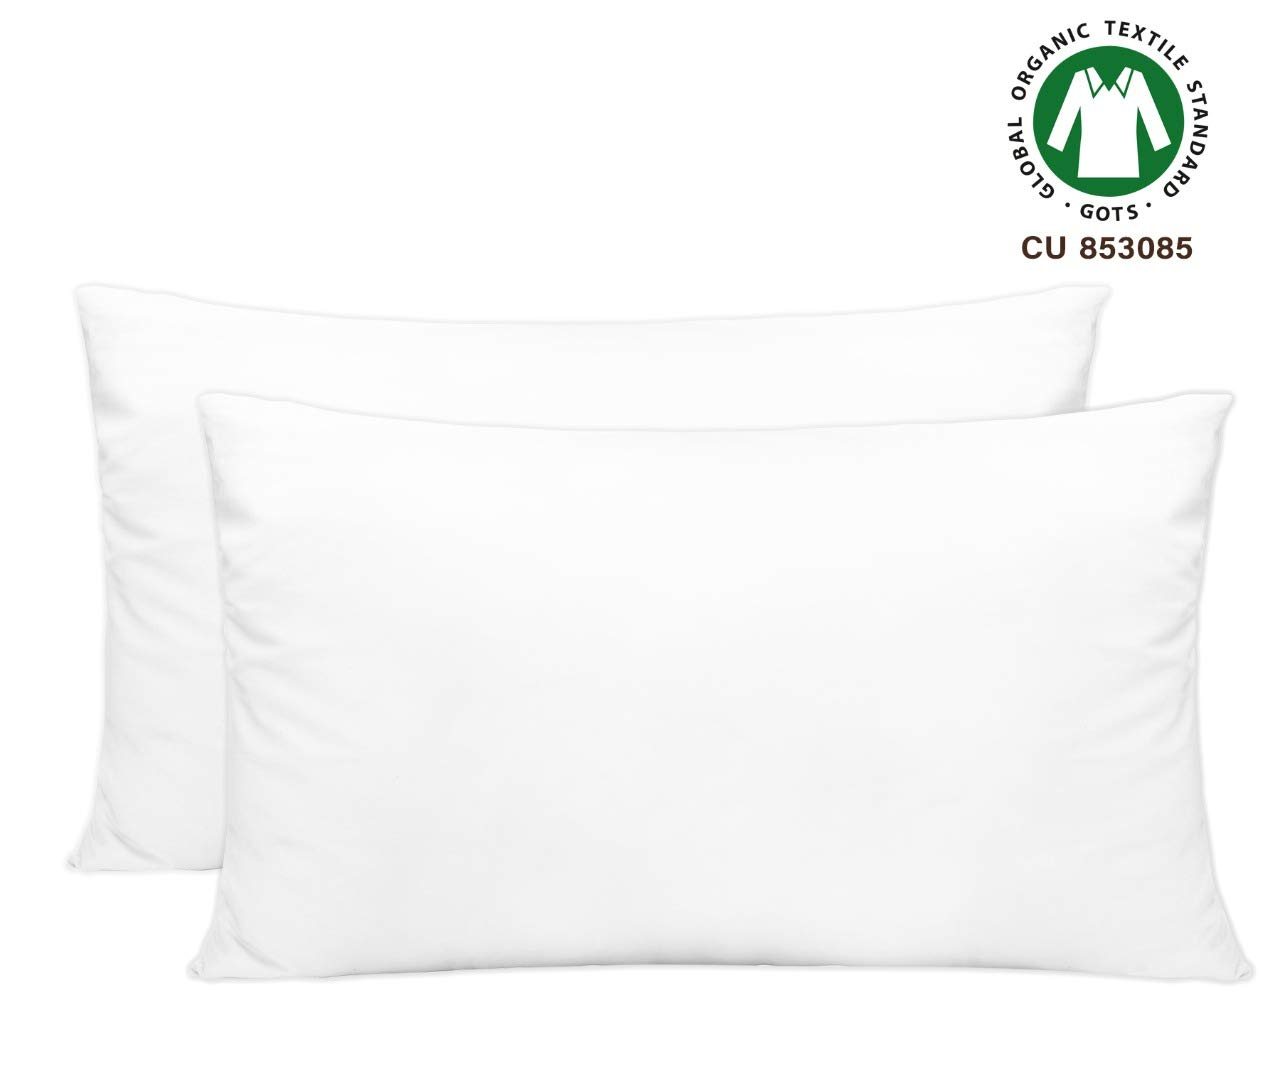 Cotton Pillow Cases King - Organic Pillow Cases - White Pillow Covers King - Organic Cotton Pillow Cases - King Pillow Cases Set of 2 White - GOTS Certified - Cotton Pillow Protector (21x40), White